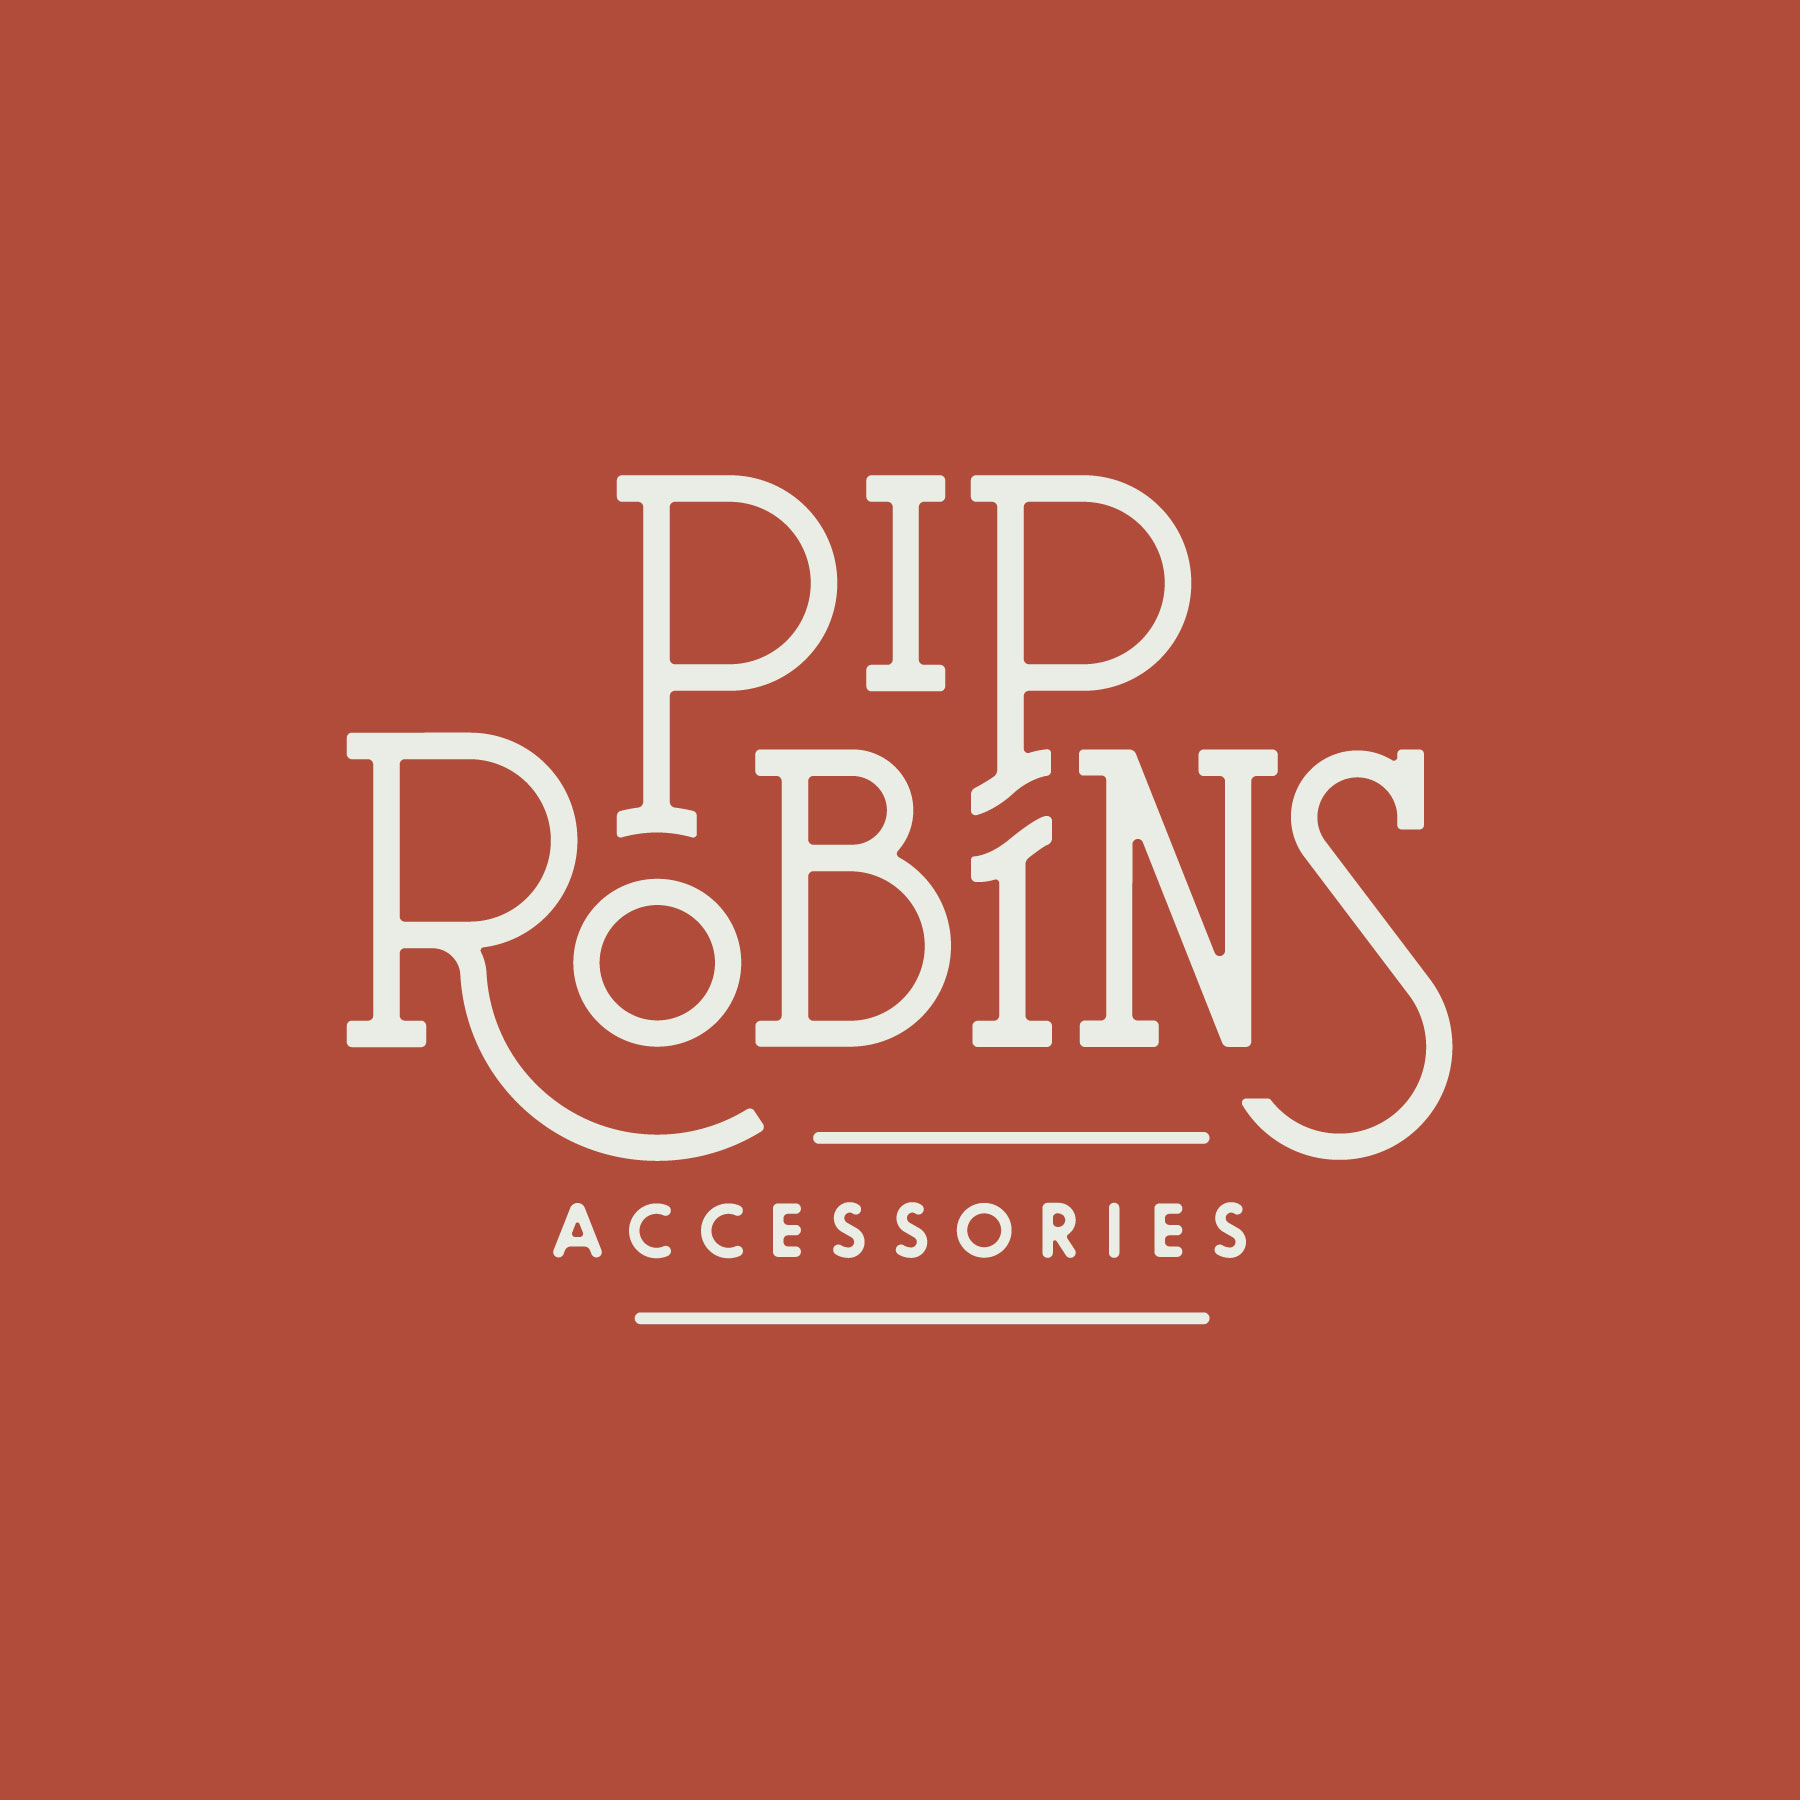 pip_robbins_logo_3.jpg